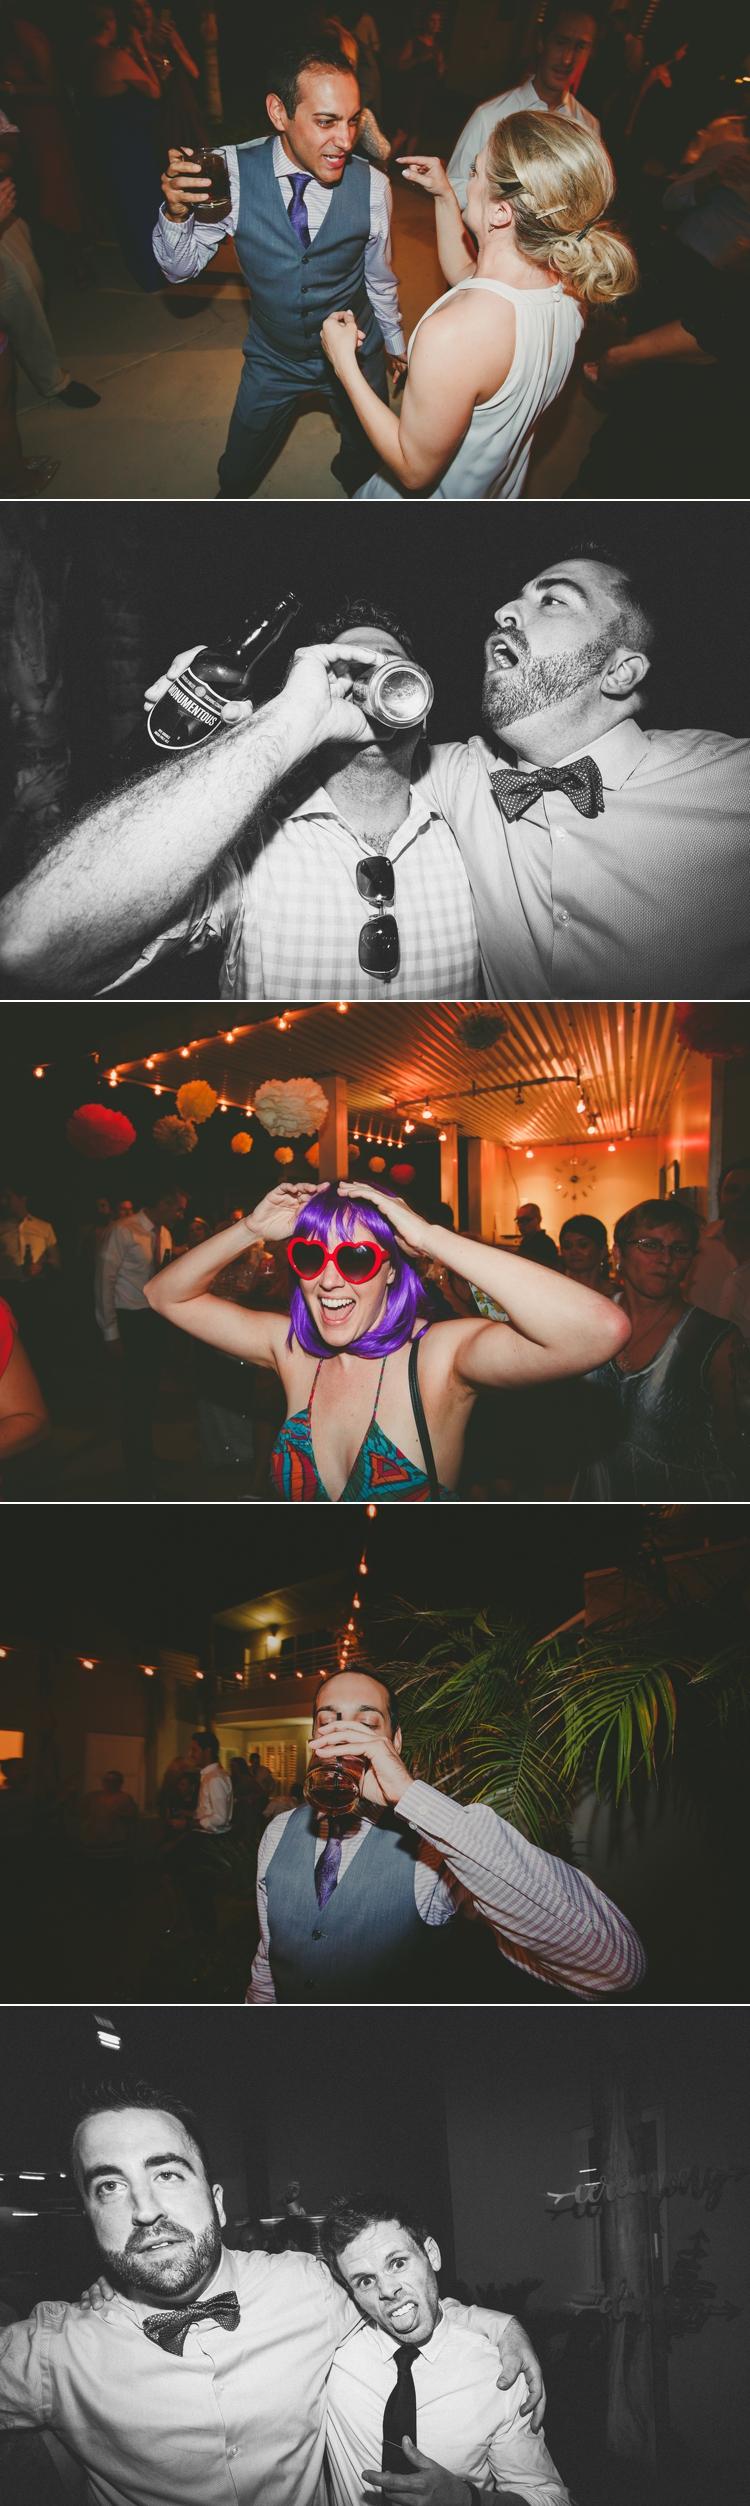 movie-colony-wedding-photos-18